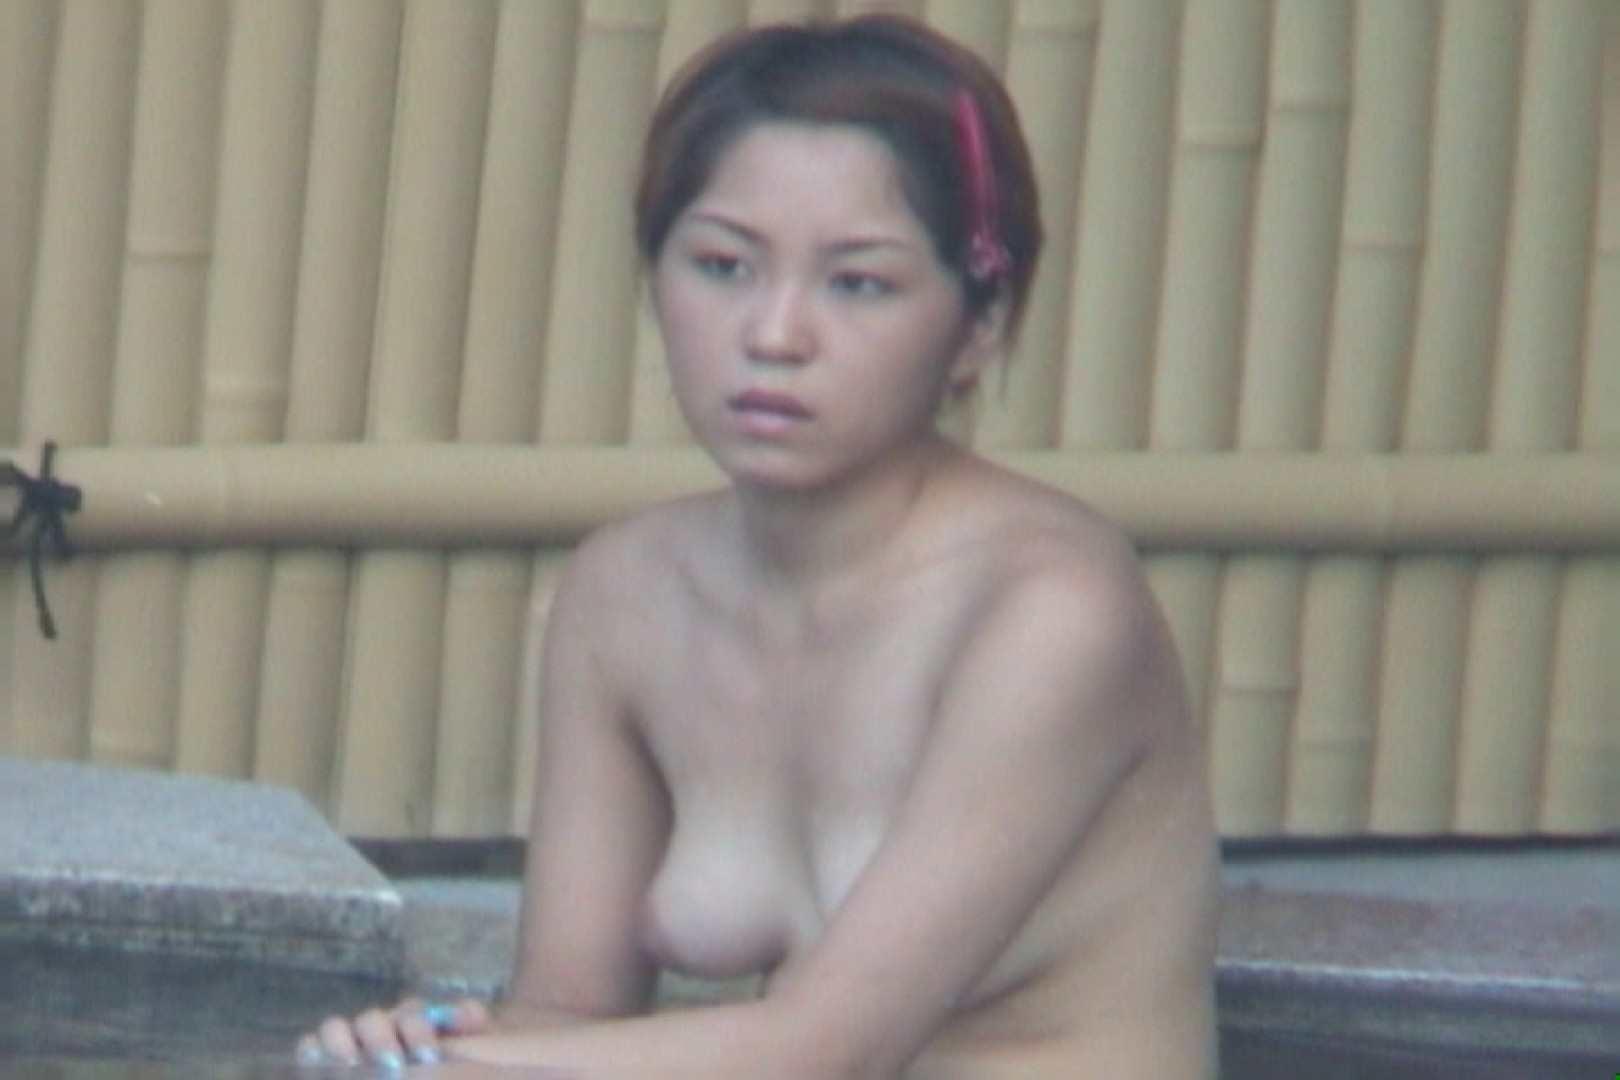 Aquaな露天風呂Vol.574 盗撮 | OLセックス  97画像 73